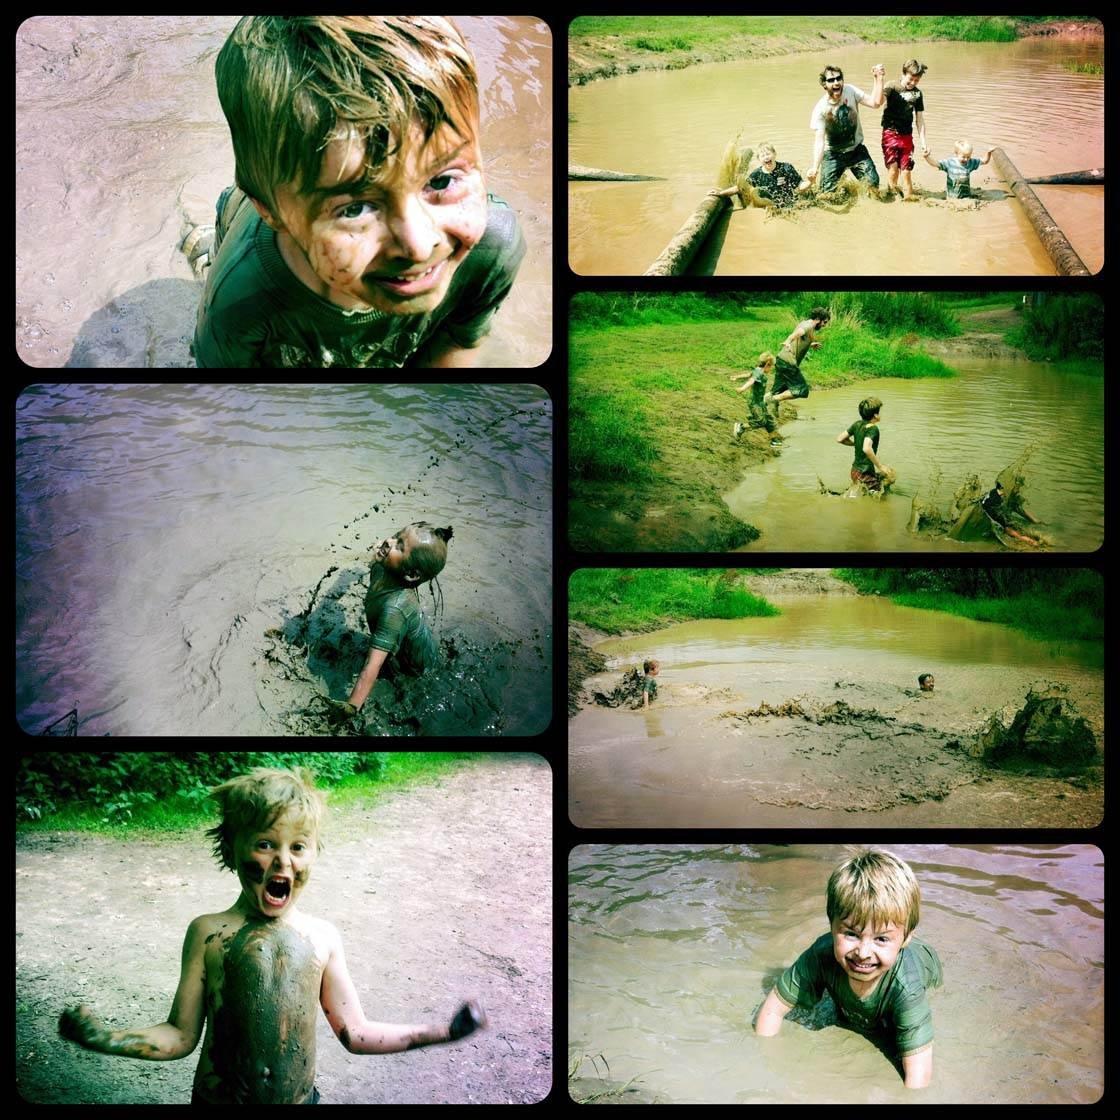 iPhone Photo Collages 12 no script